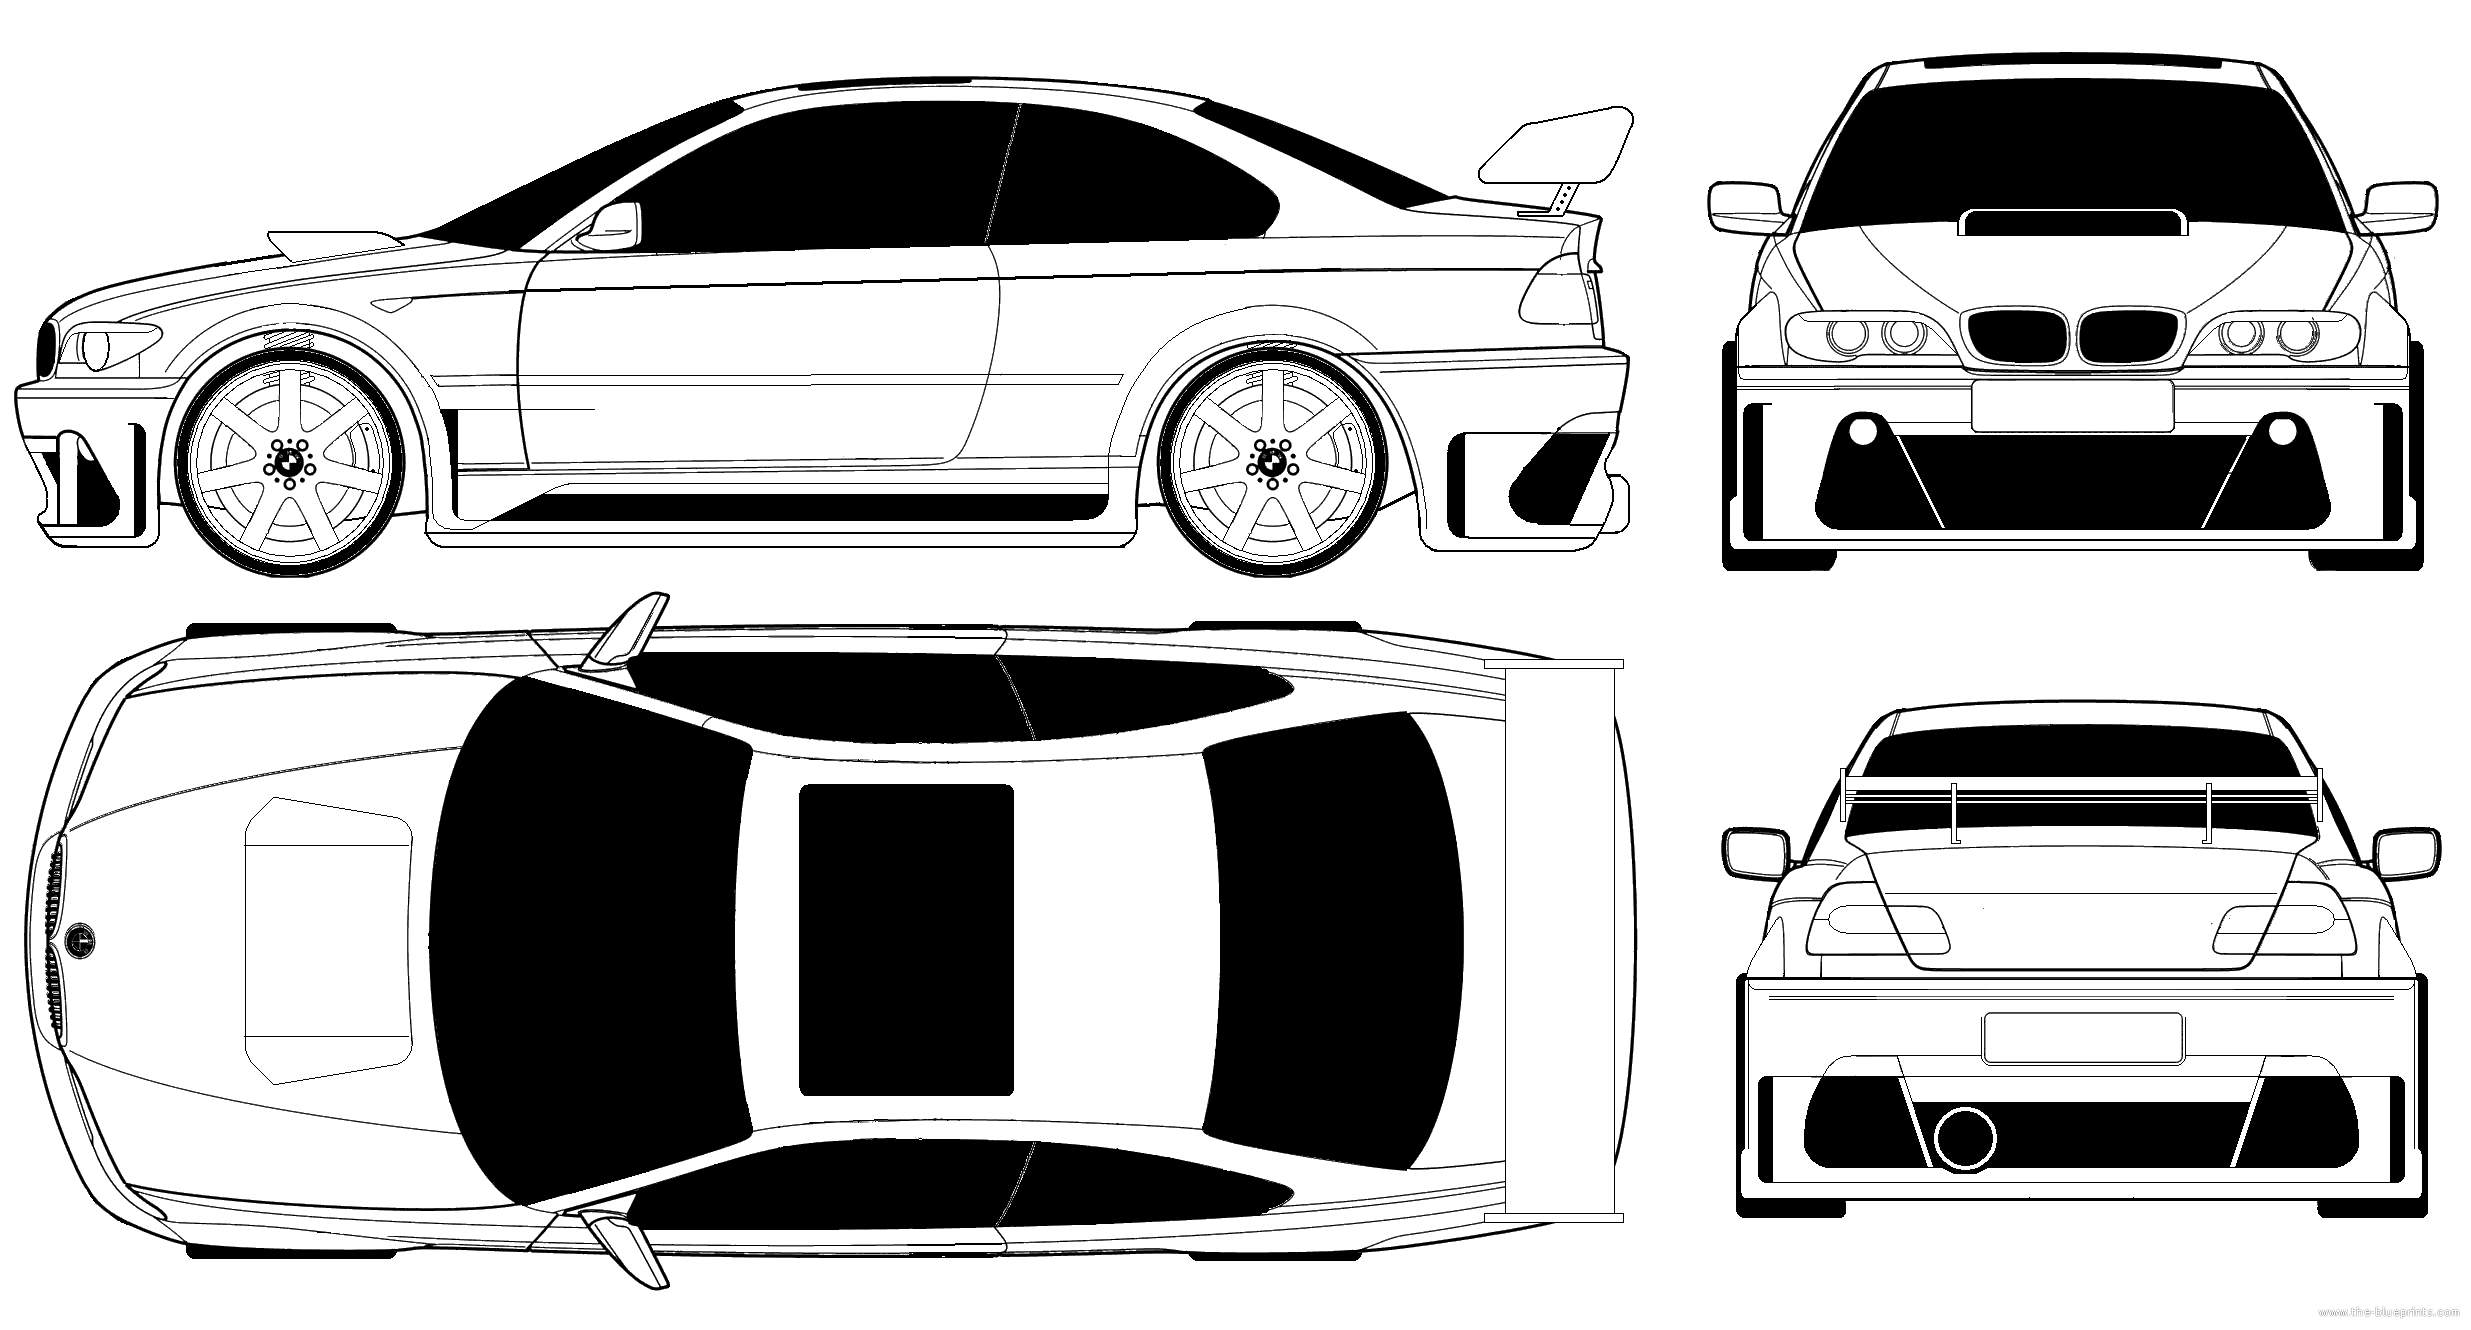 Blueprints cars bmw bmw 3 series coupe e46 tuned bmw 3 series coupe e46 tuned malvernweather Image collections